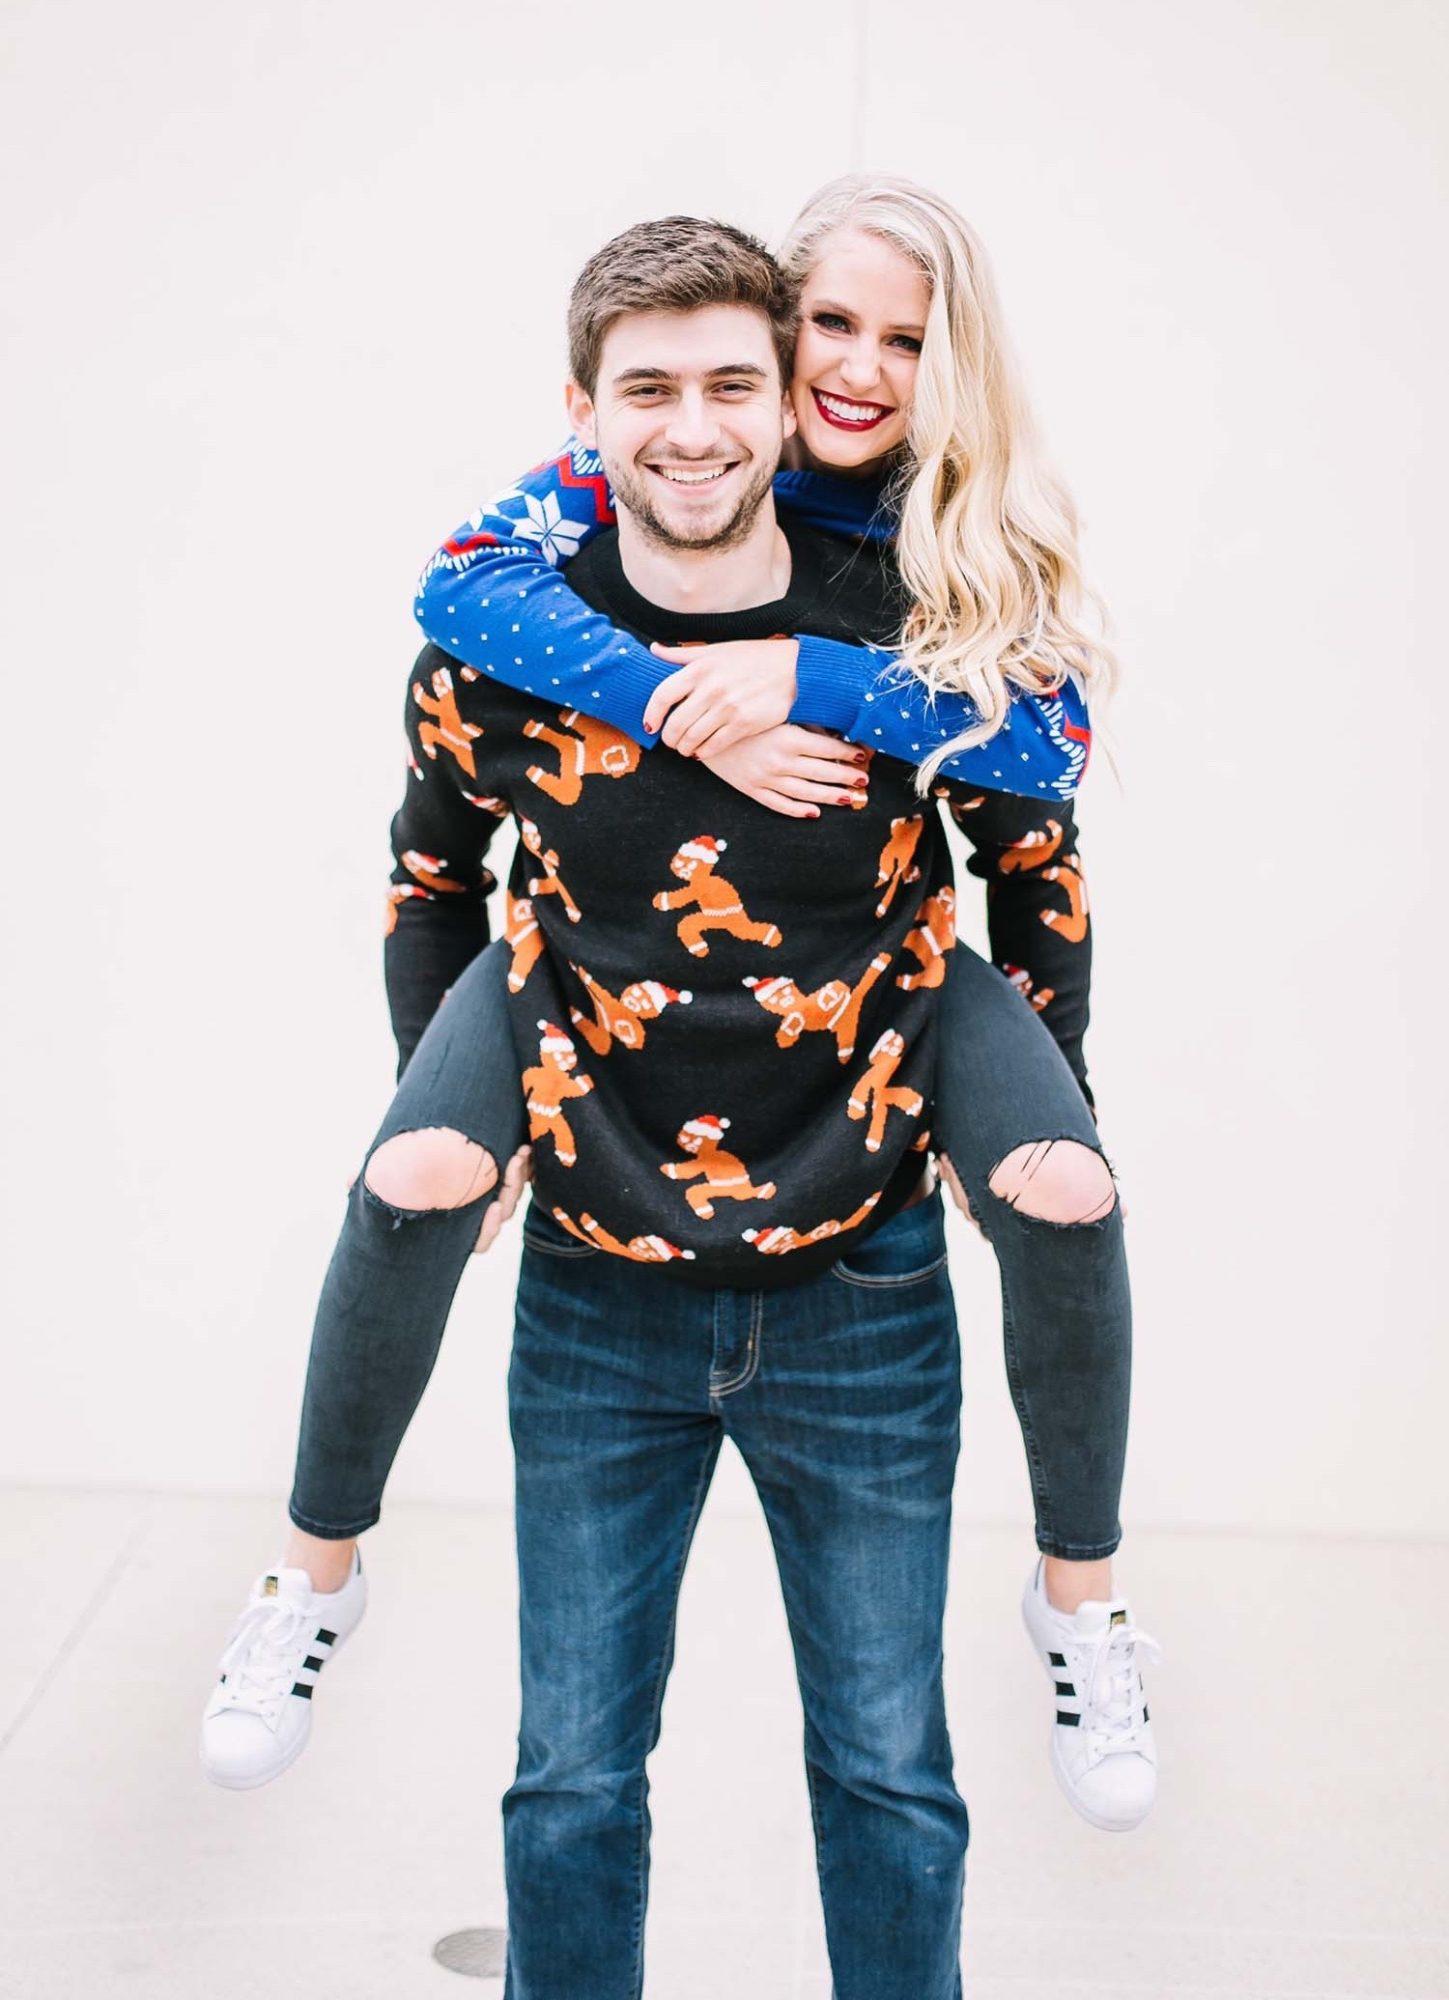 Wishlist Wednesday: Tacky Holiday Sweaters